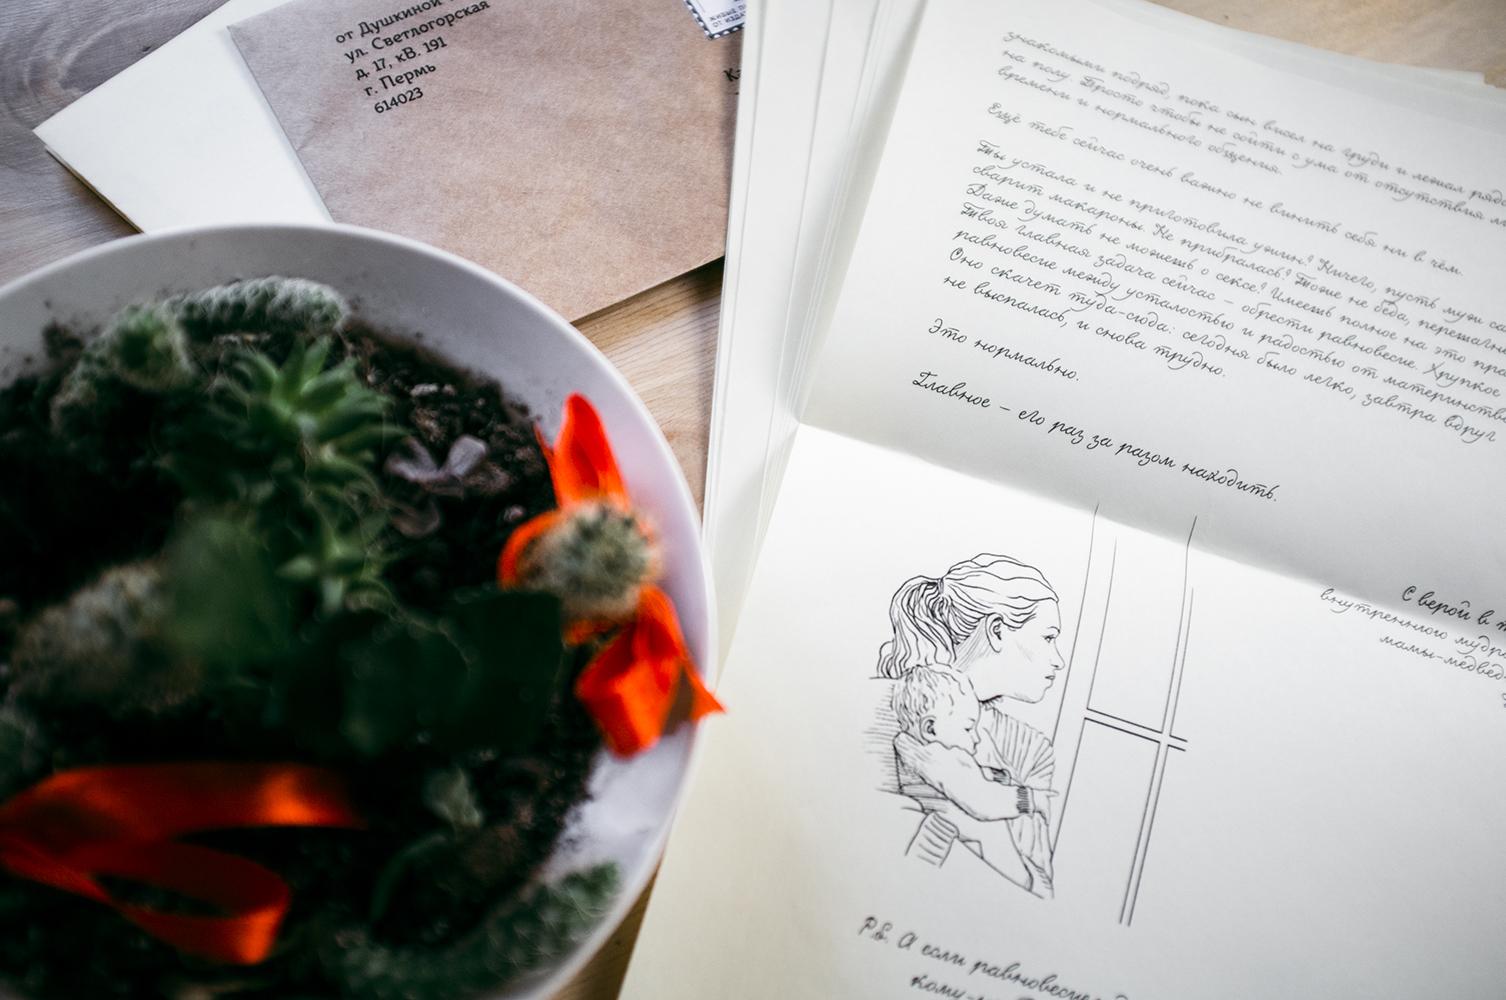 Письма для мамы | Домашнее издательство Skrebeyko